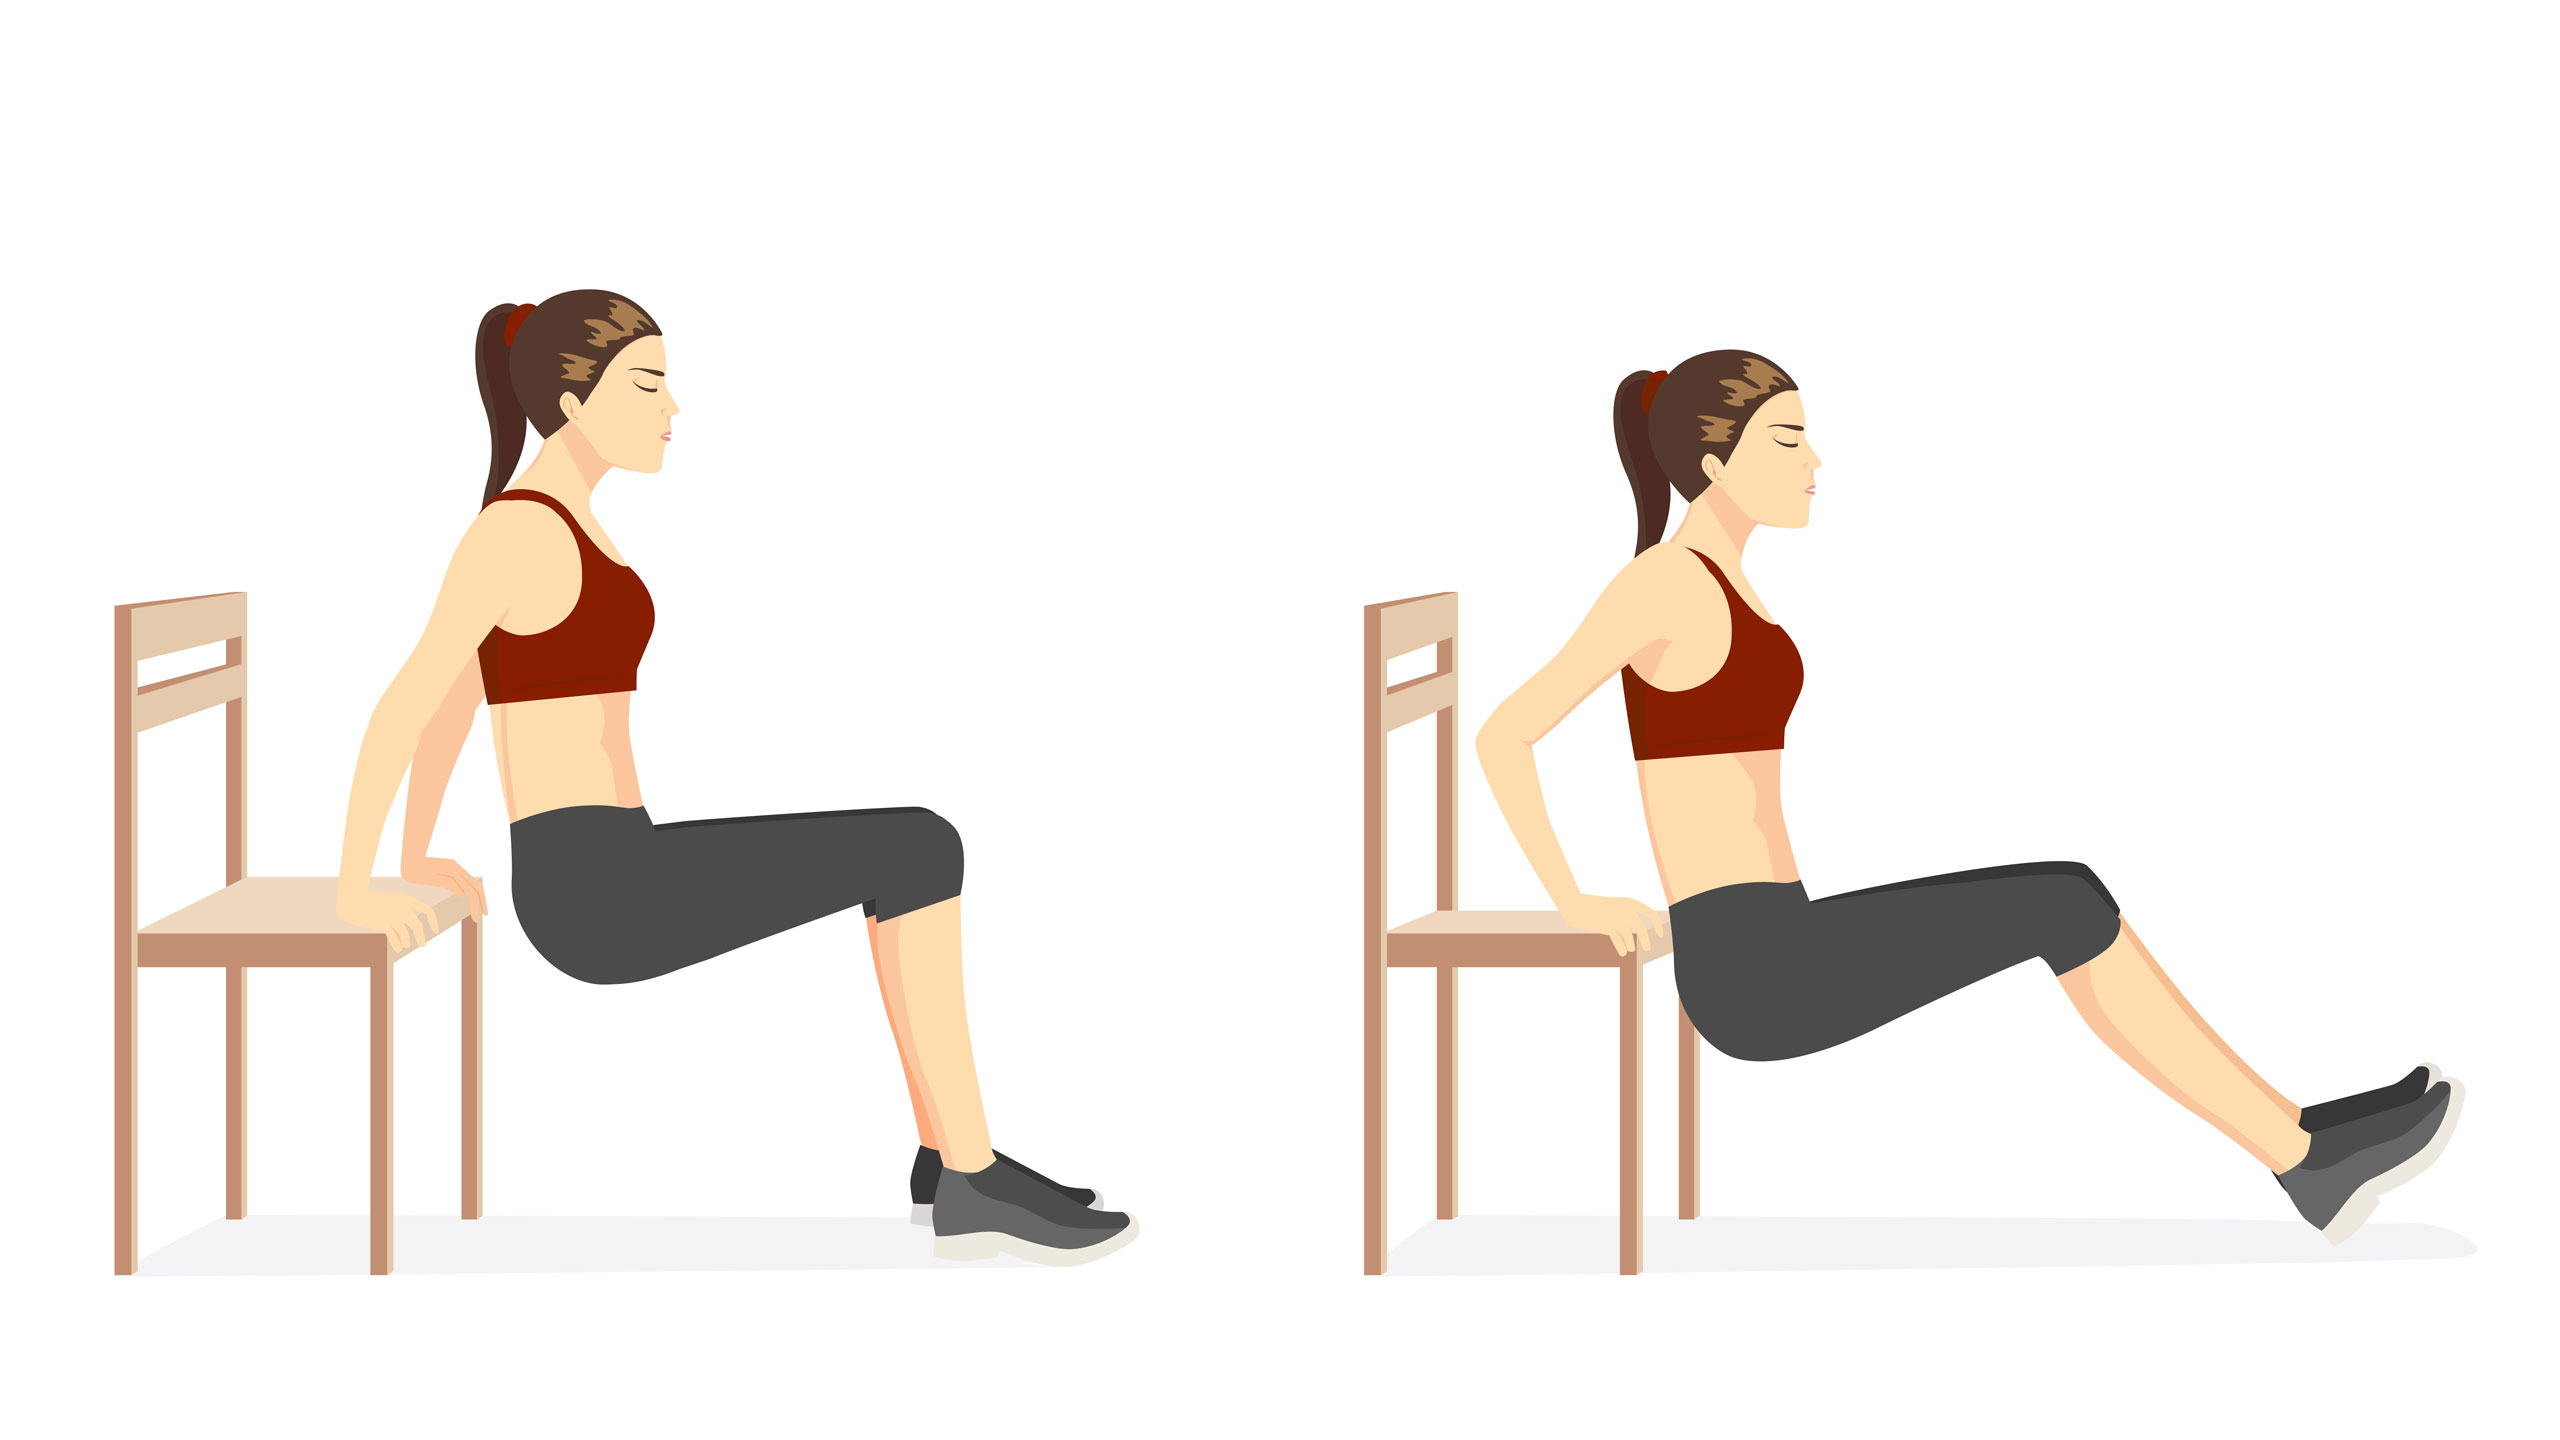 Interliving_Workout_Moebel_Armdips